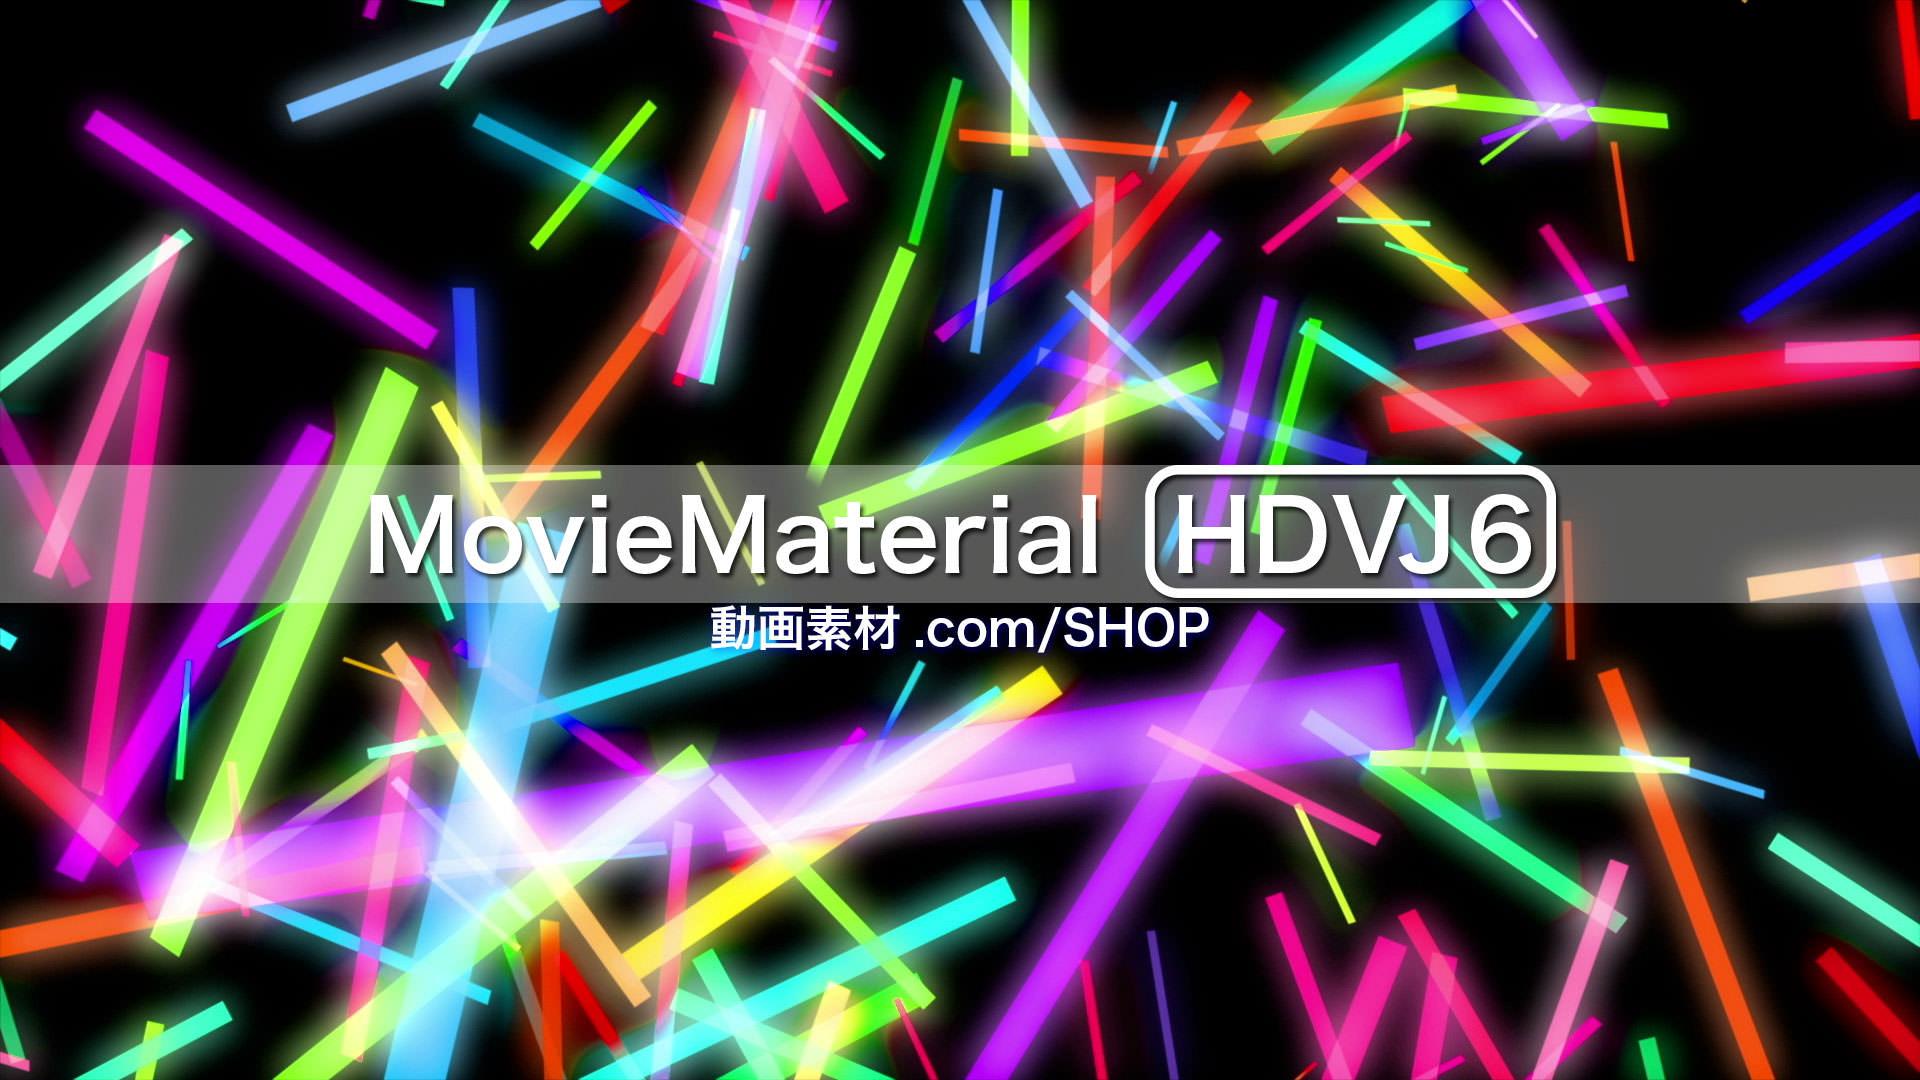 MovieMaterial HDVJ6 フルハイビジョンVJ動画素材集 画像5